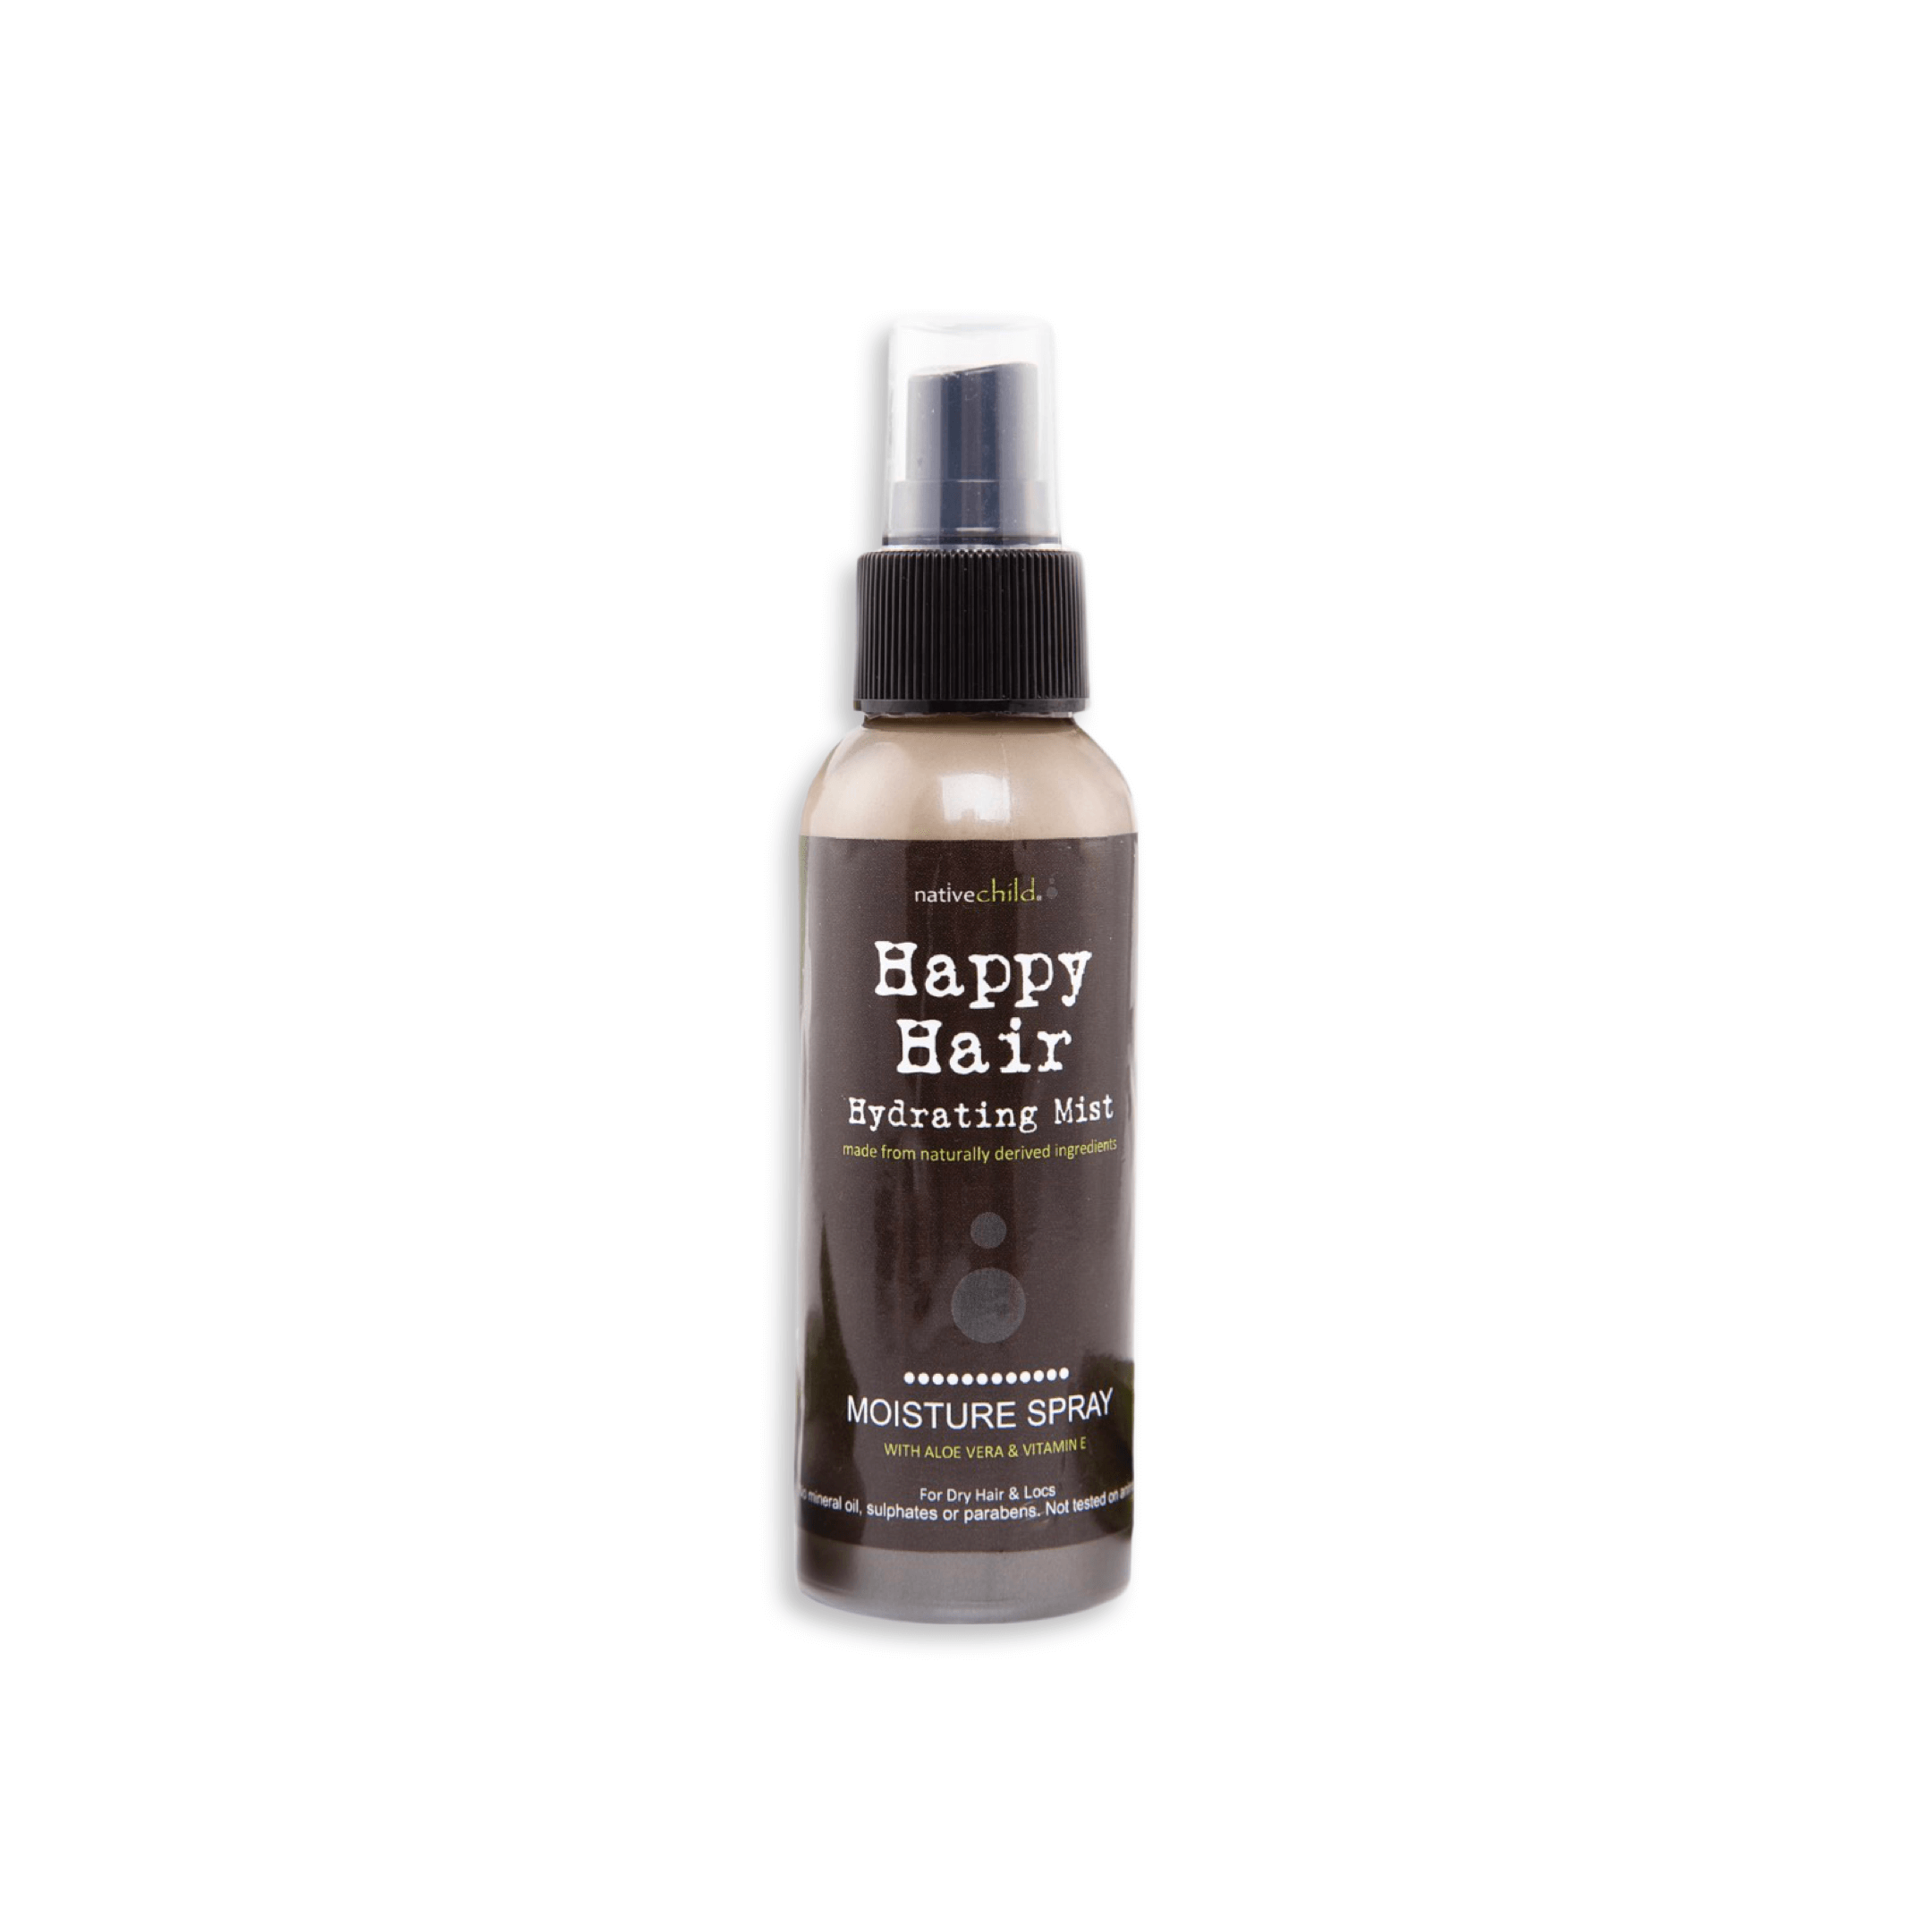 Happy Hair Hydrating Mist